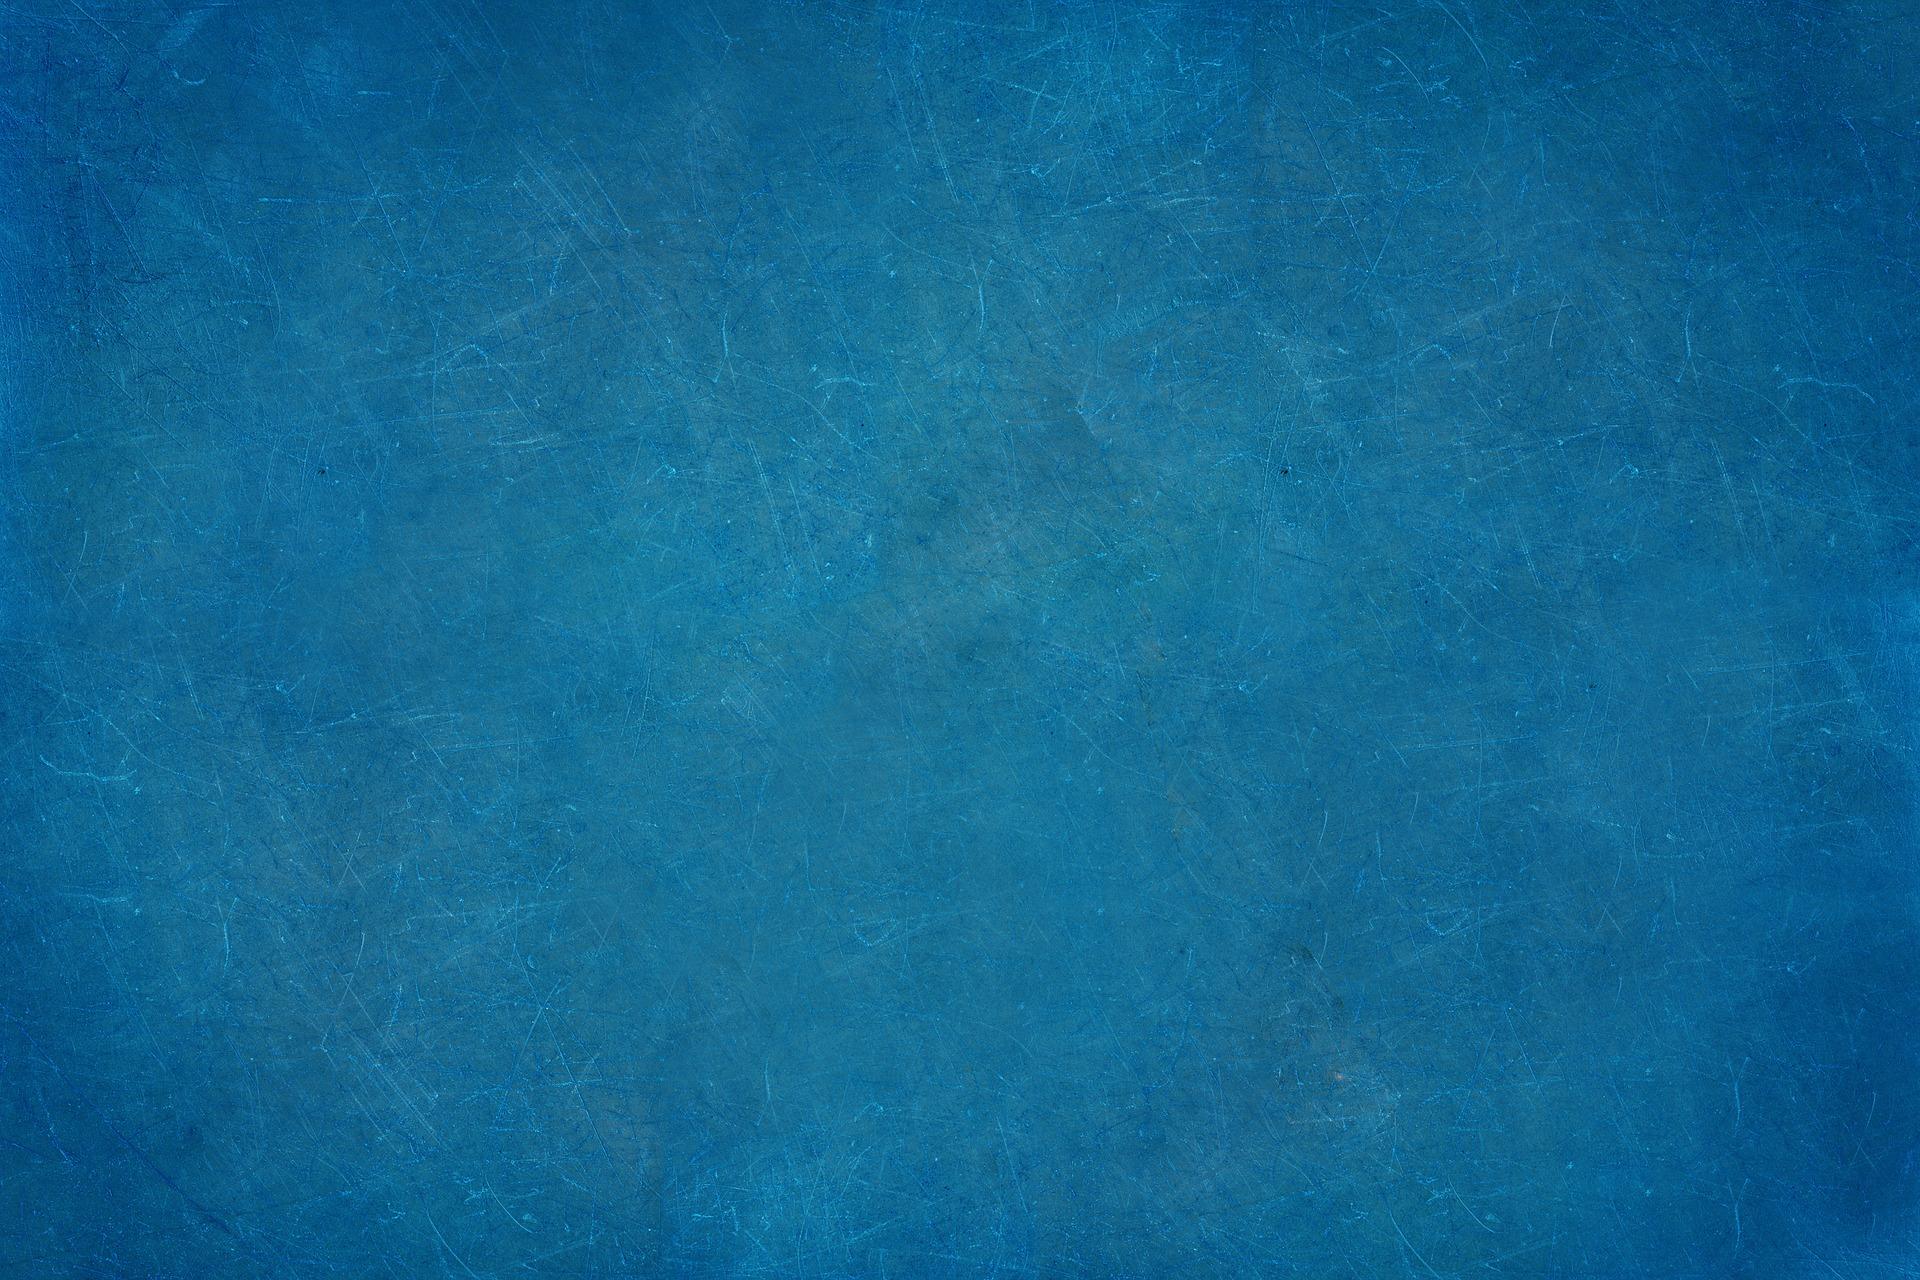 background-3246124_1920